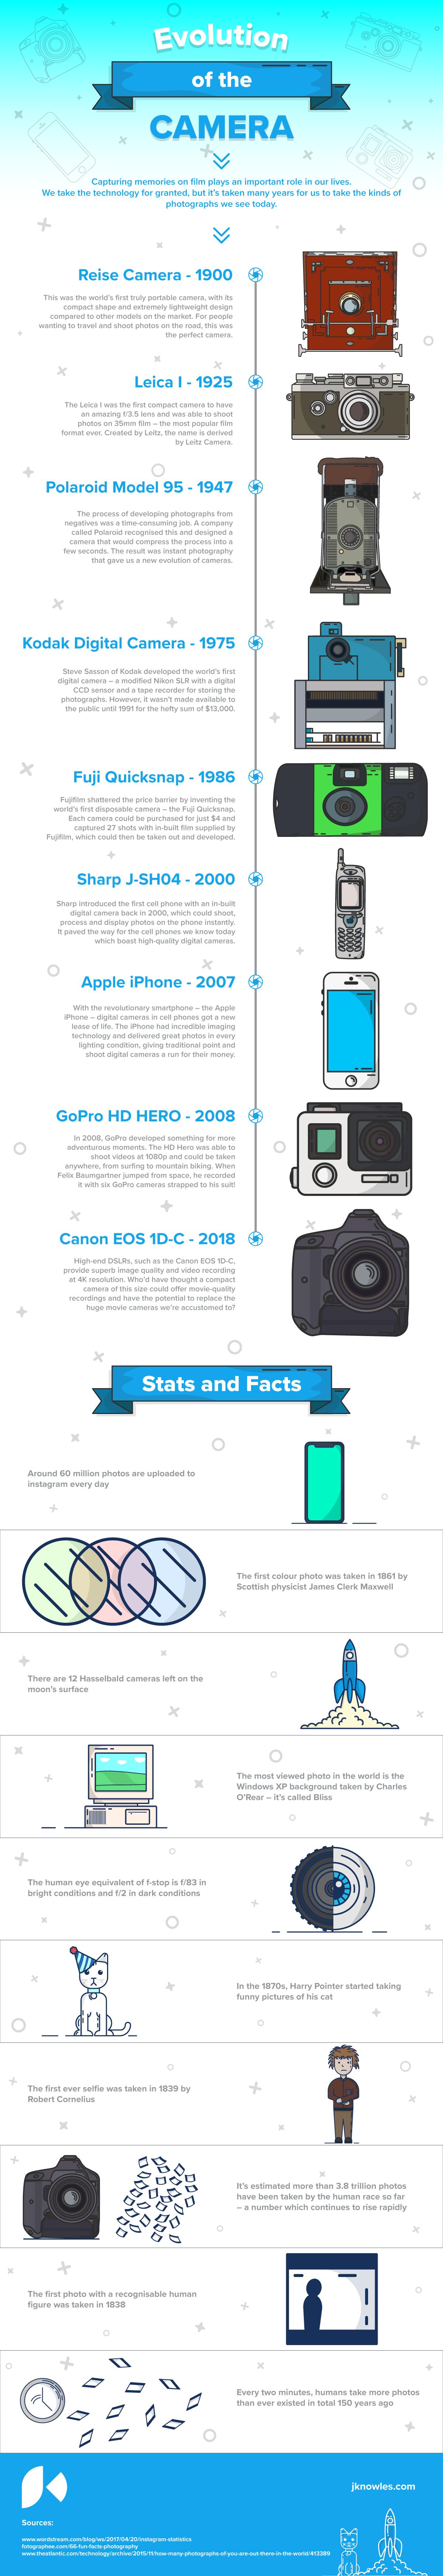 Evolution of the Camera